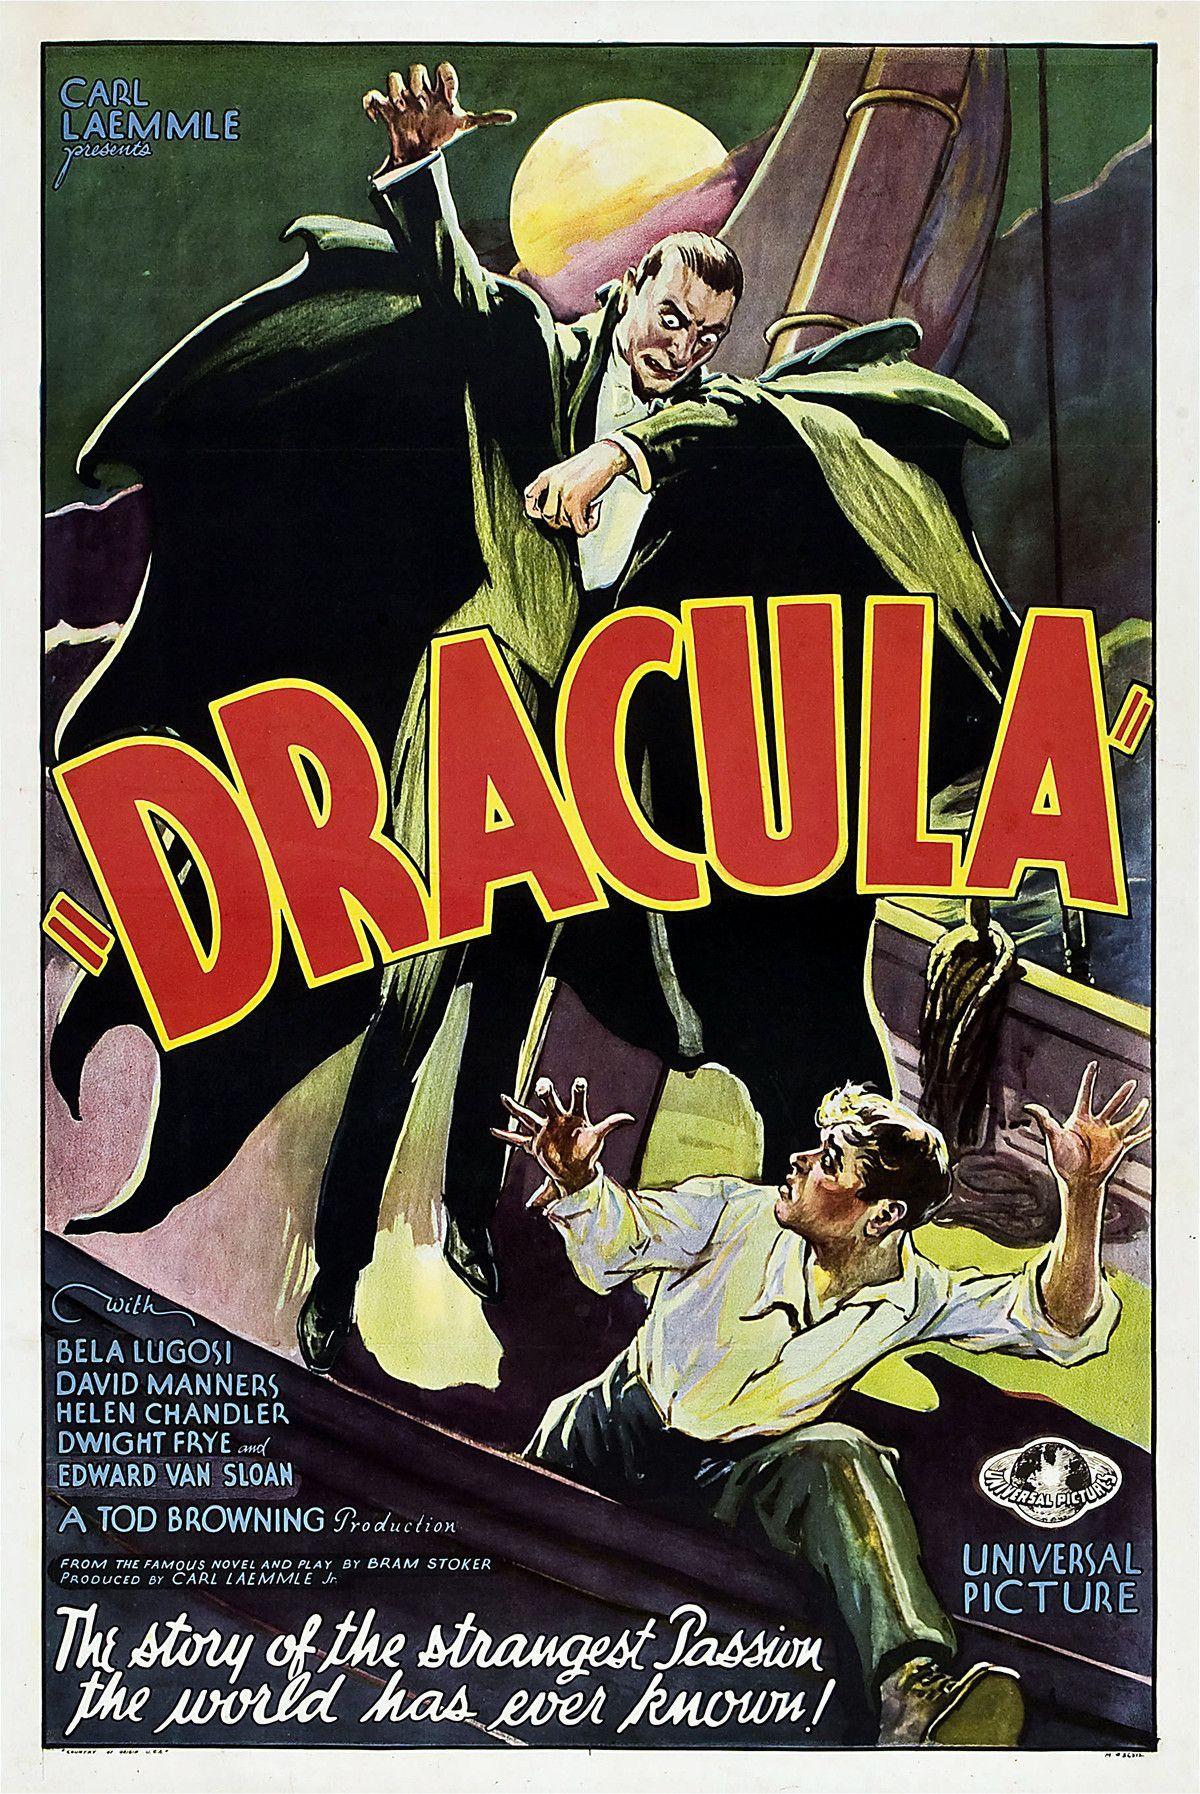 Carl Laemmle Presents Dracula With Bela Lugosi David Manners